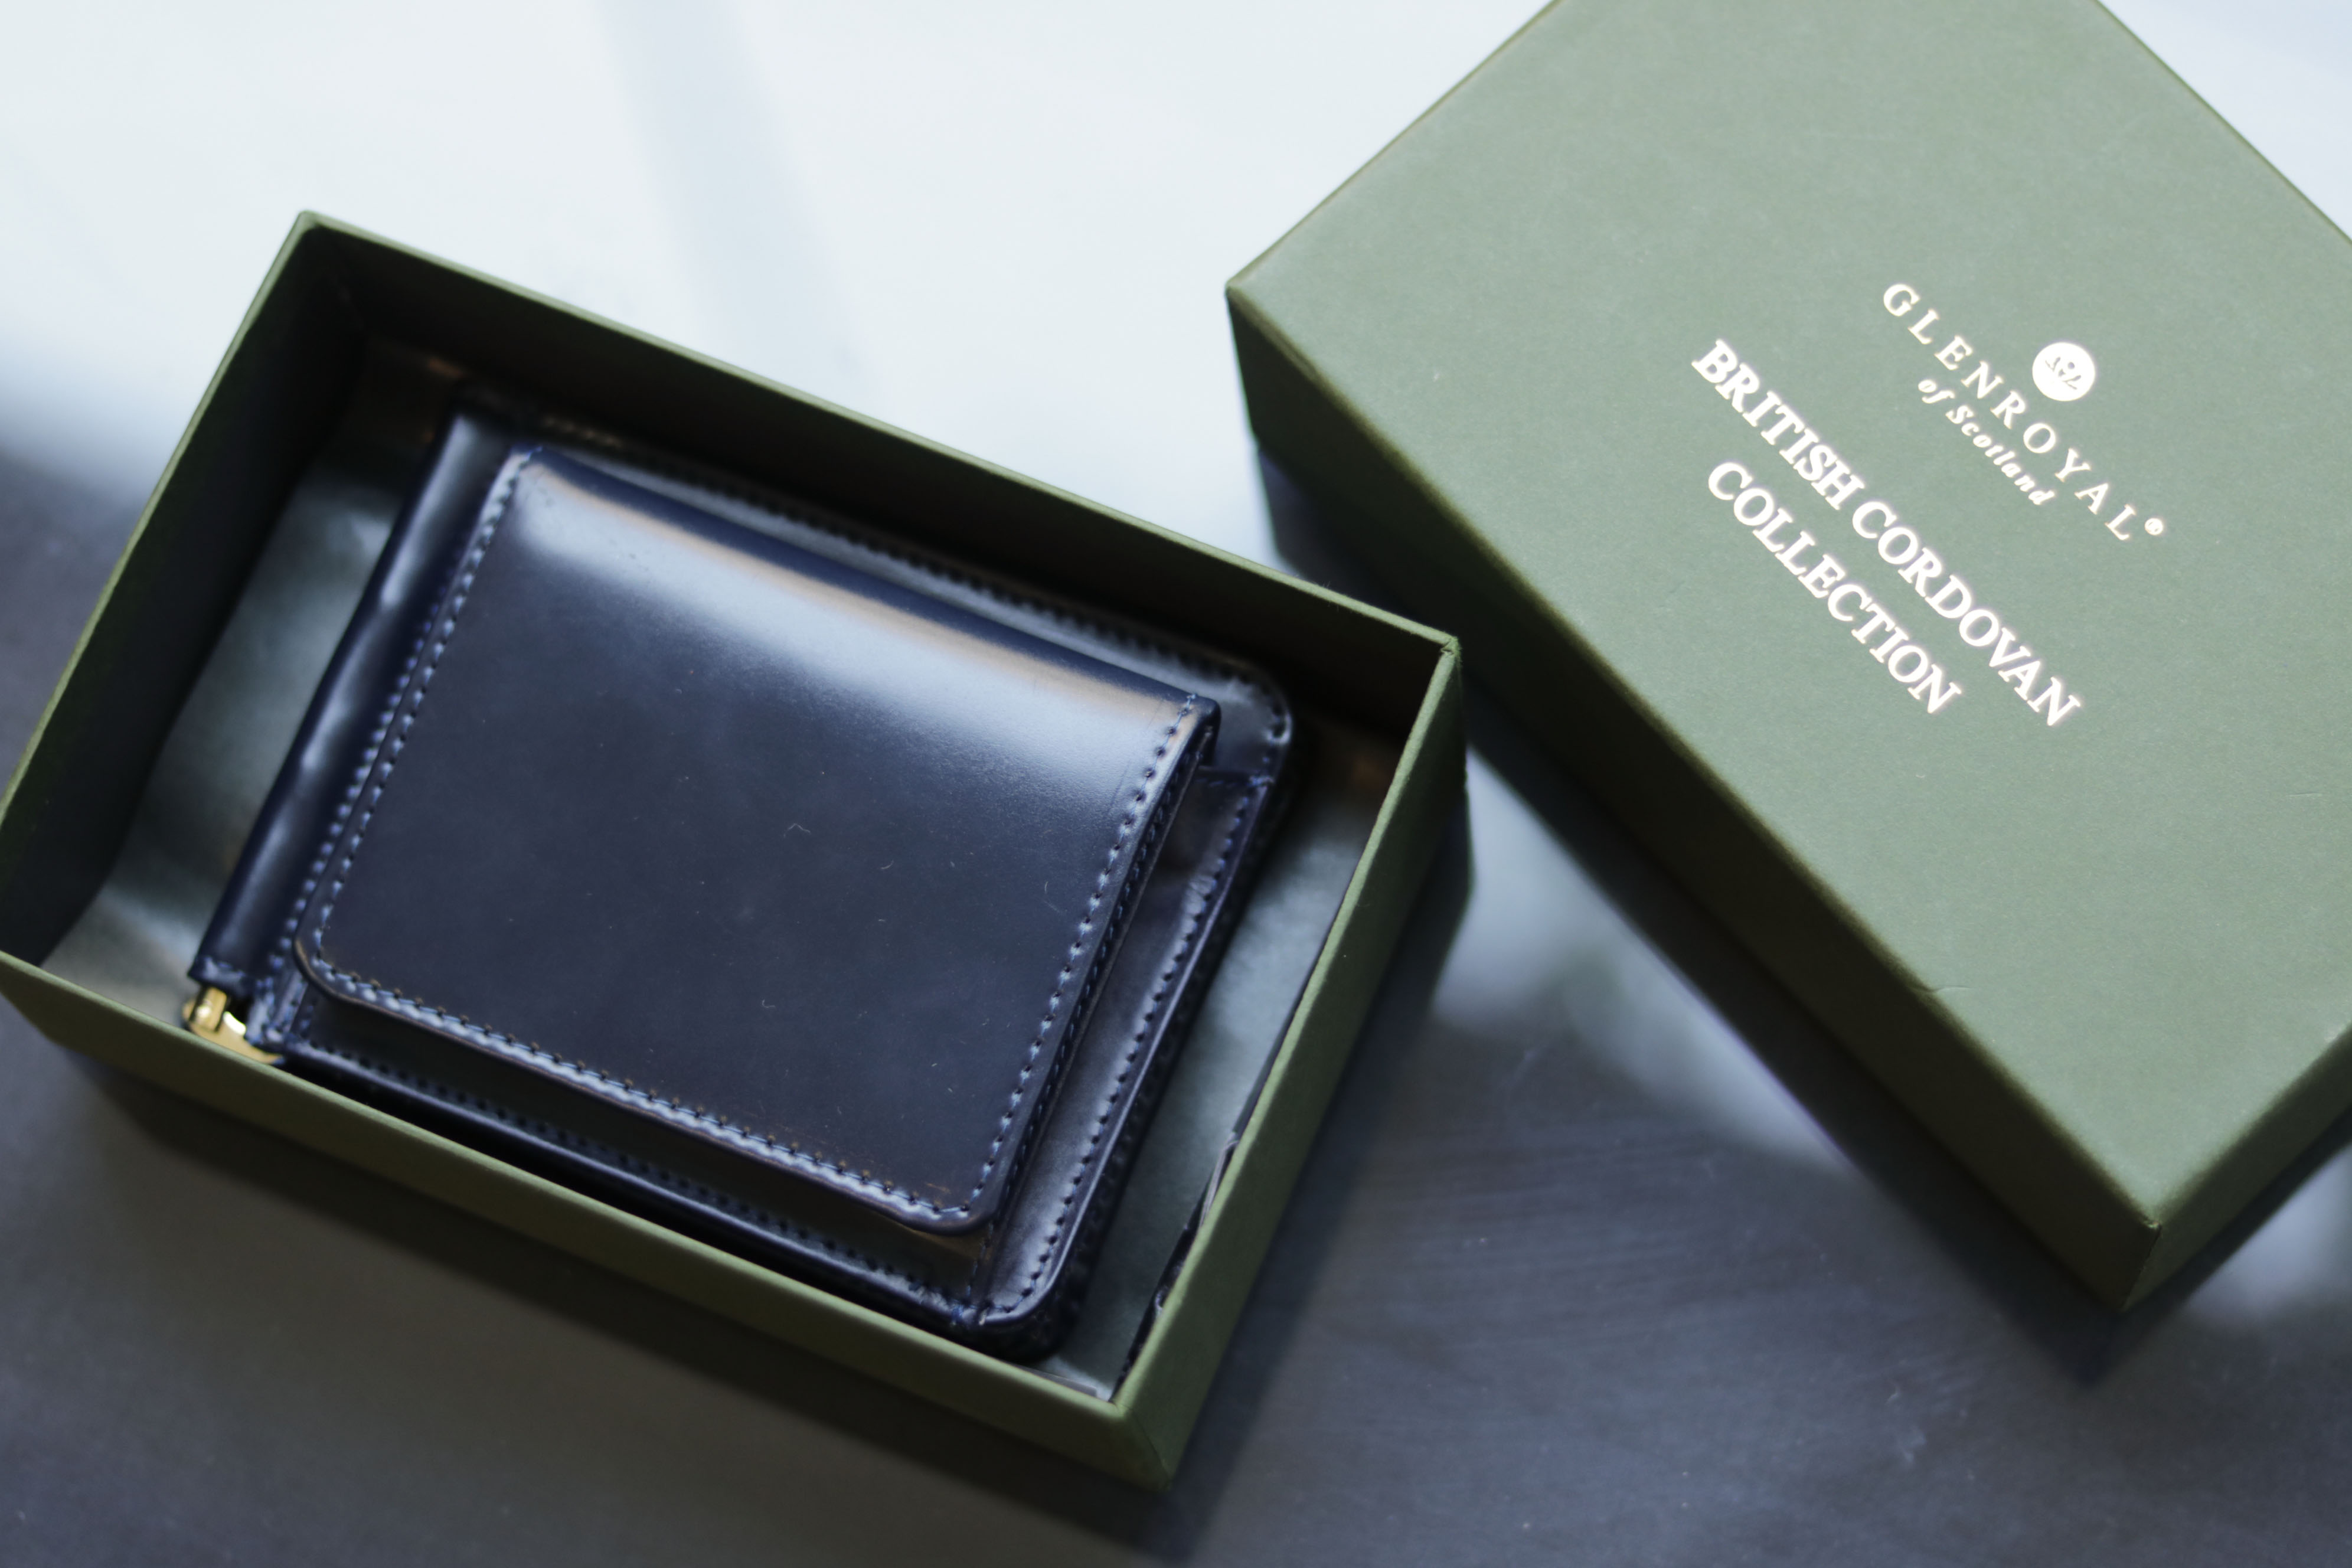 GLENROYAL / グレンロイヤル - MONEY CLIP WITH COIN POCKET 74,520円(税込)